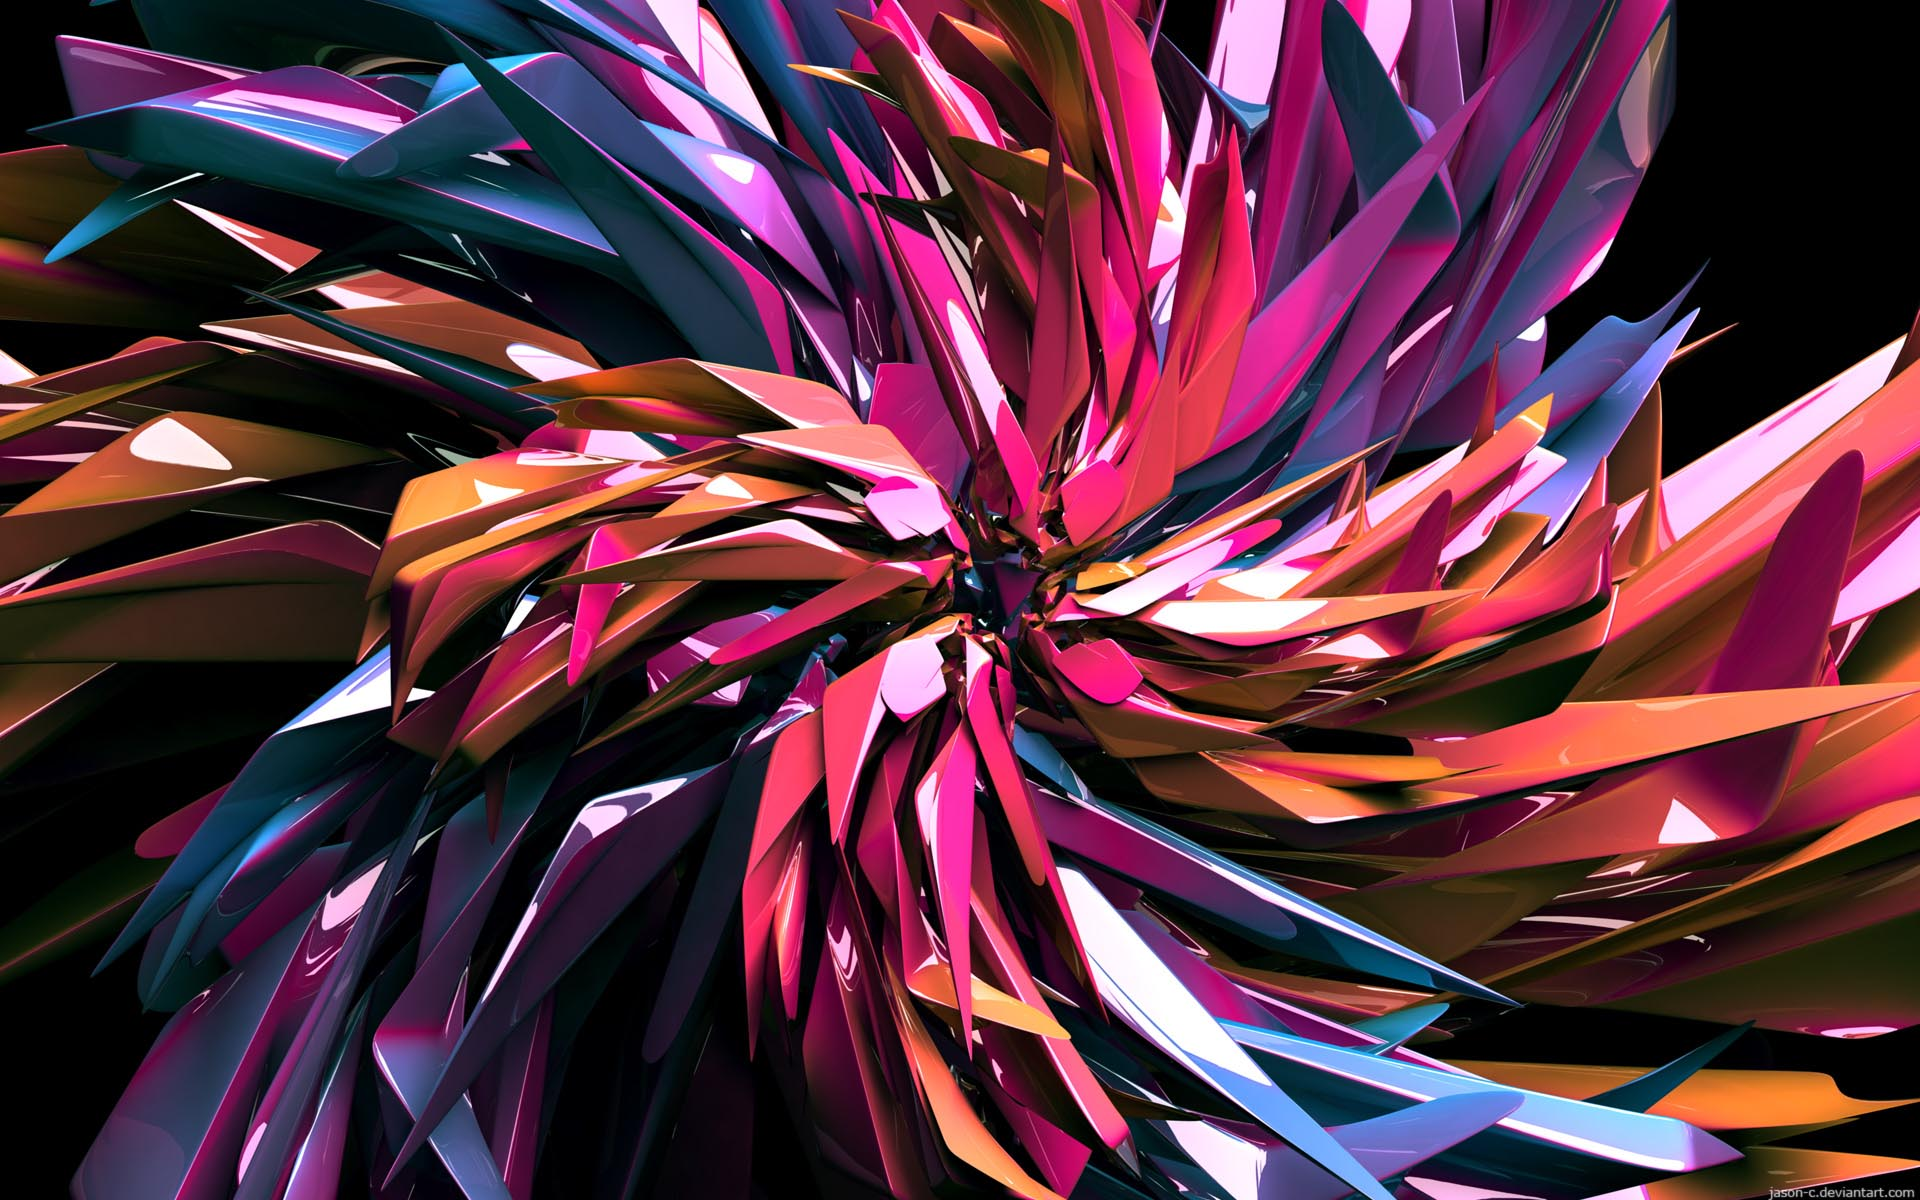 desktop wallpaper 9: Abstract Desktop Wallpaper